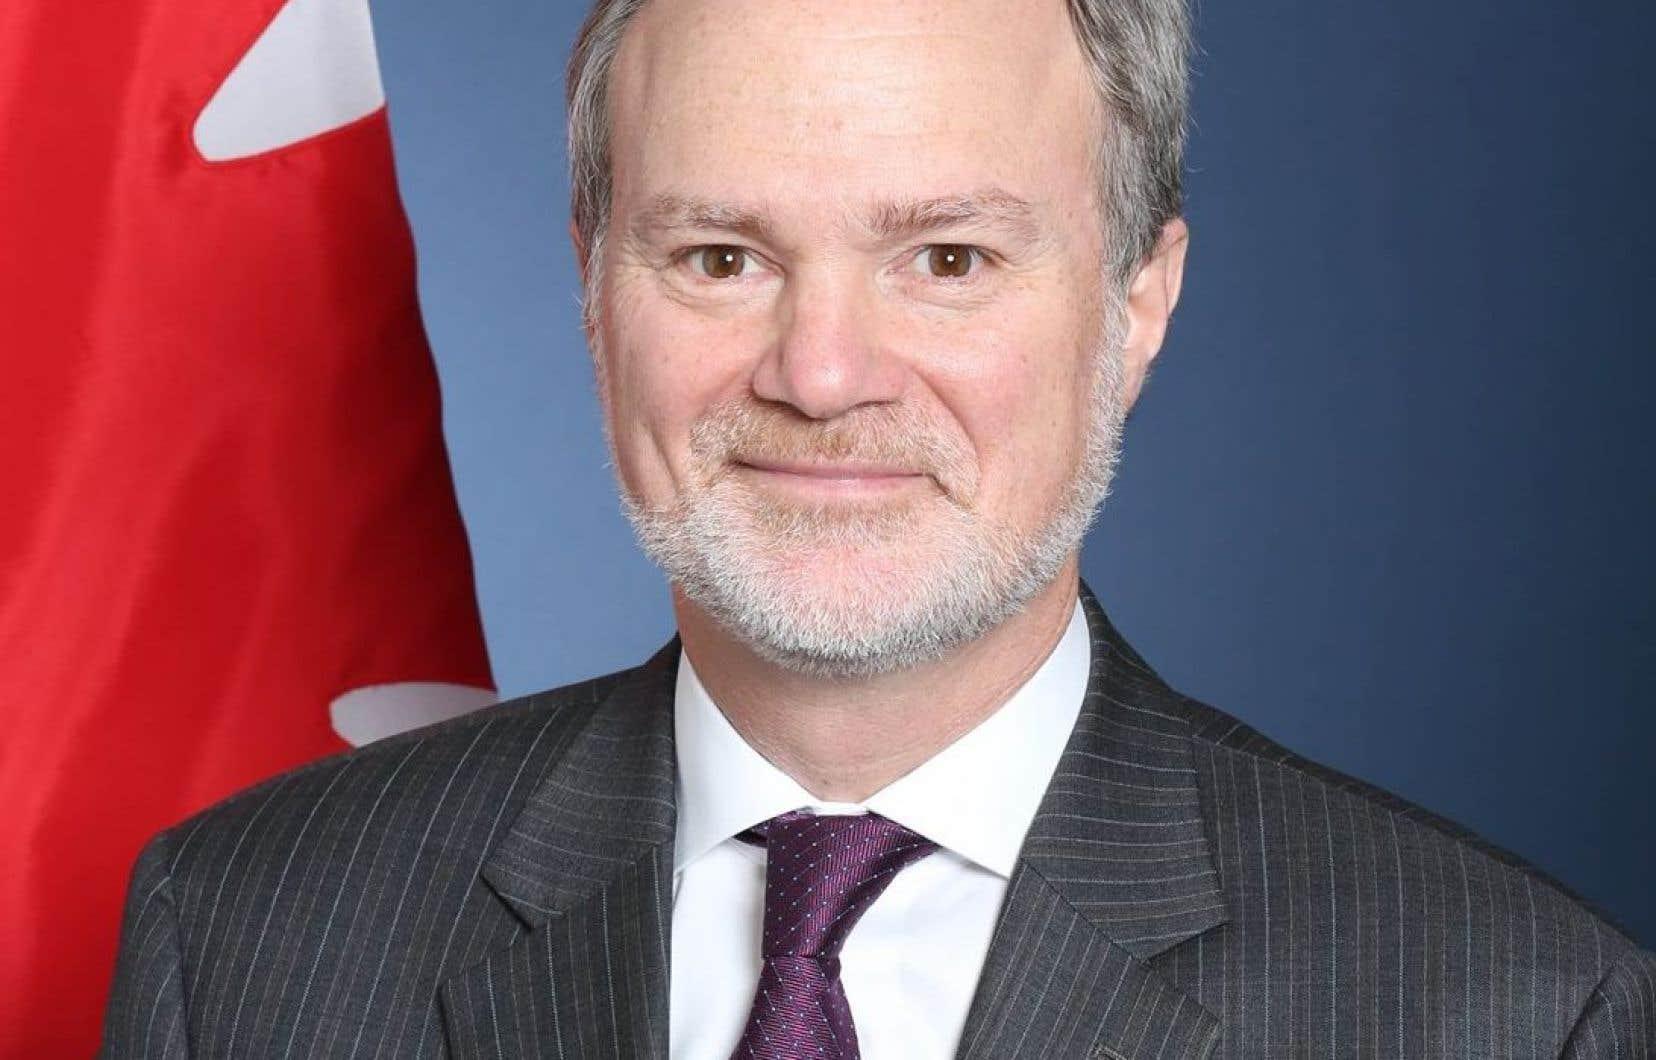 André Pratte